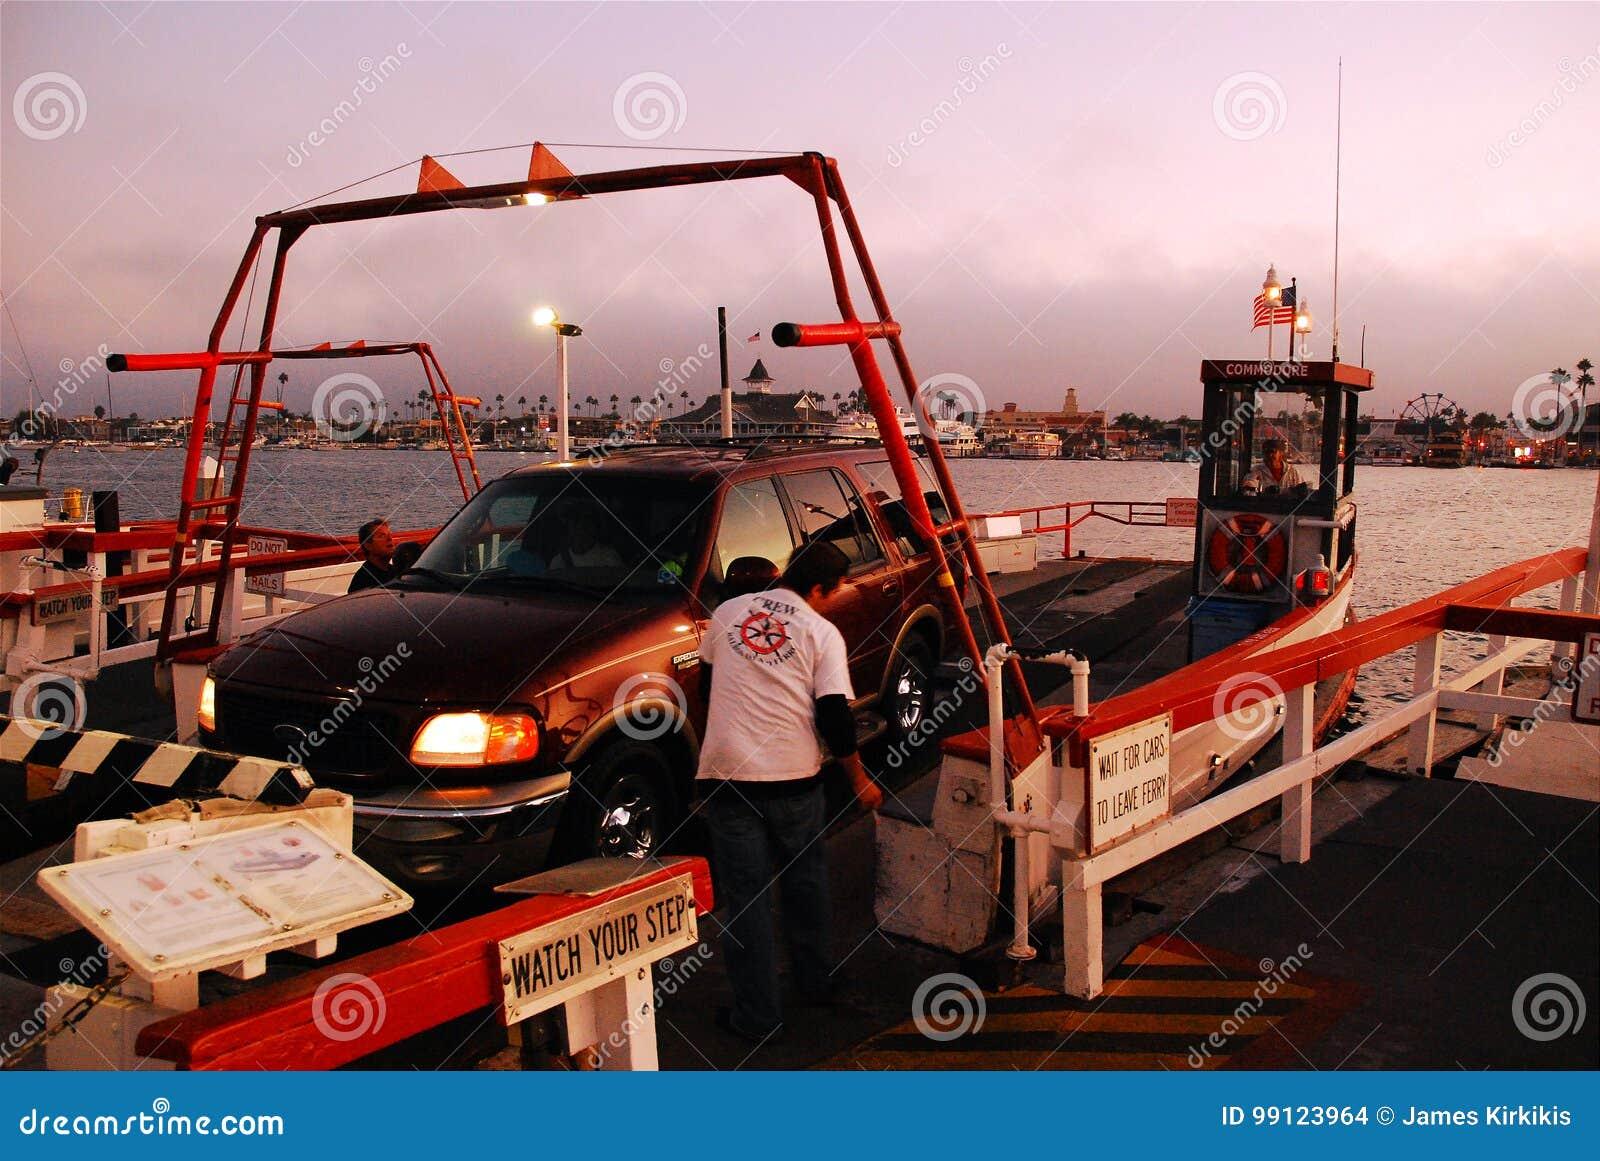 Disembarking